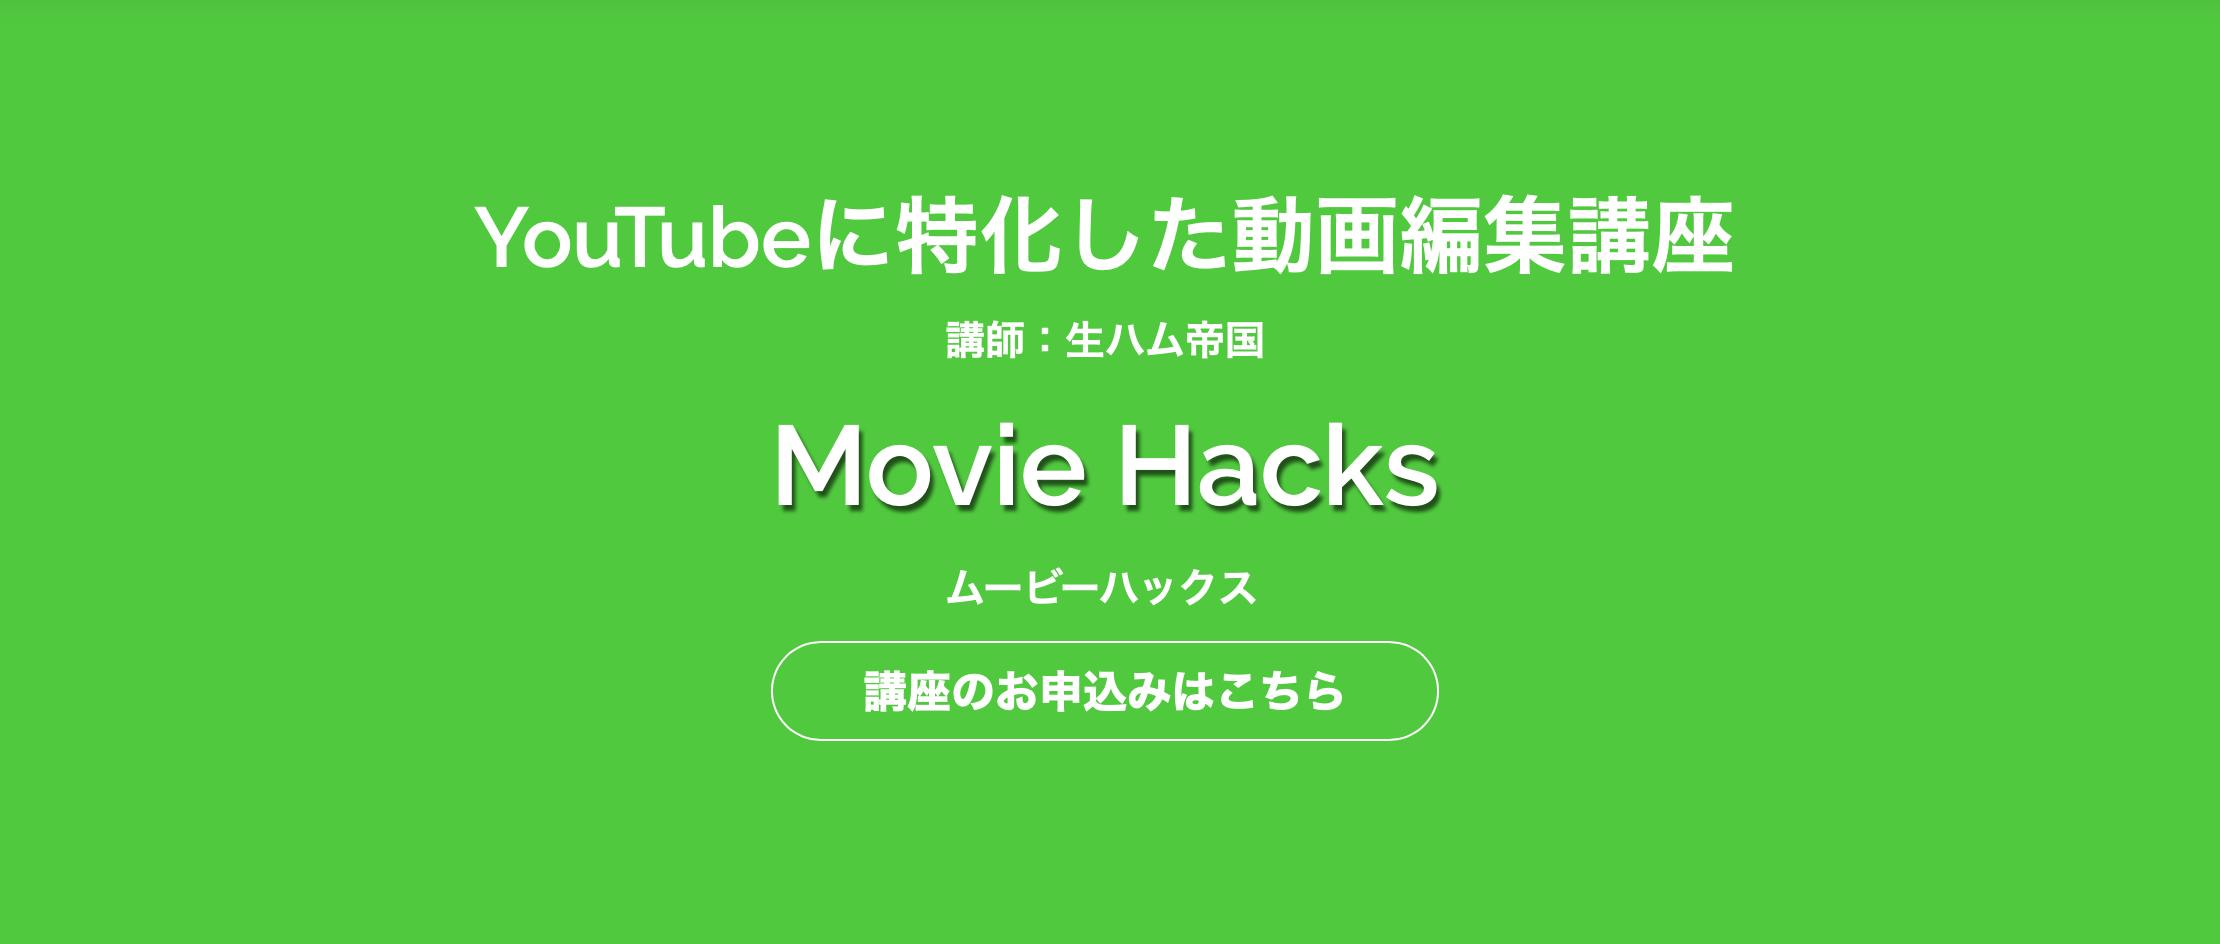 【MovieHacks】動画編集初心者が月100万円稼げるようになった1つのきっかけ